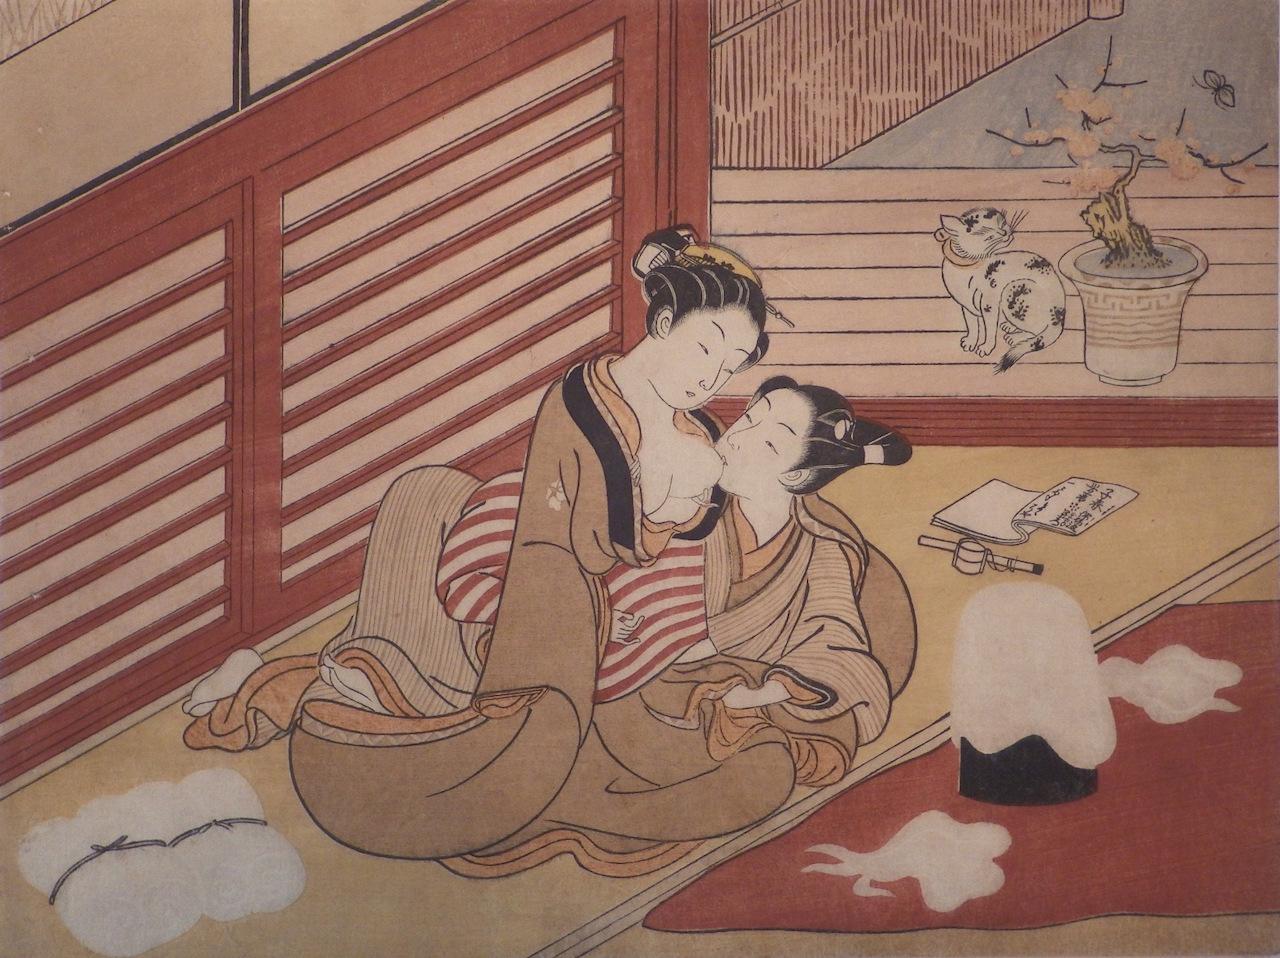 Ancient japanse erotic art girls